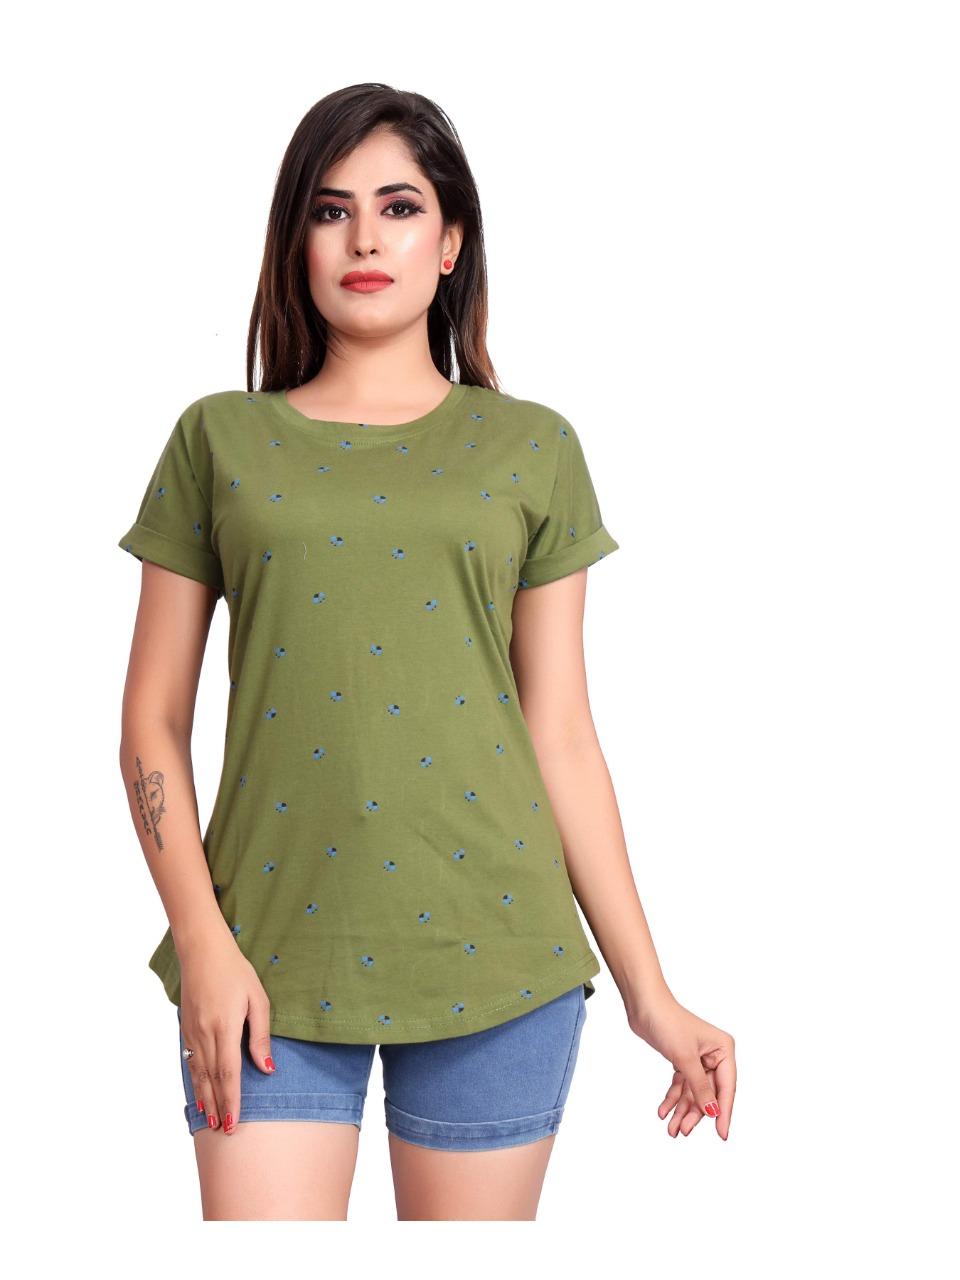 Impex   Impex Women Cotton Hosiery Printed Green Tshirt